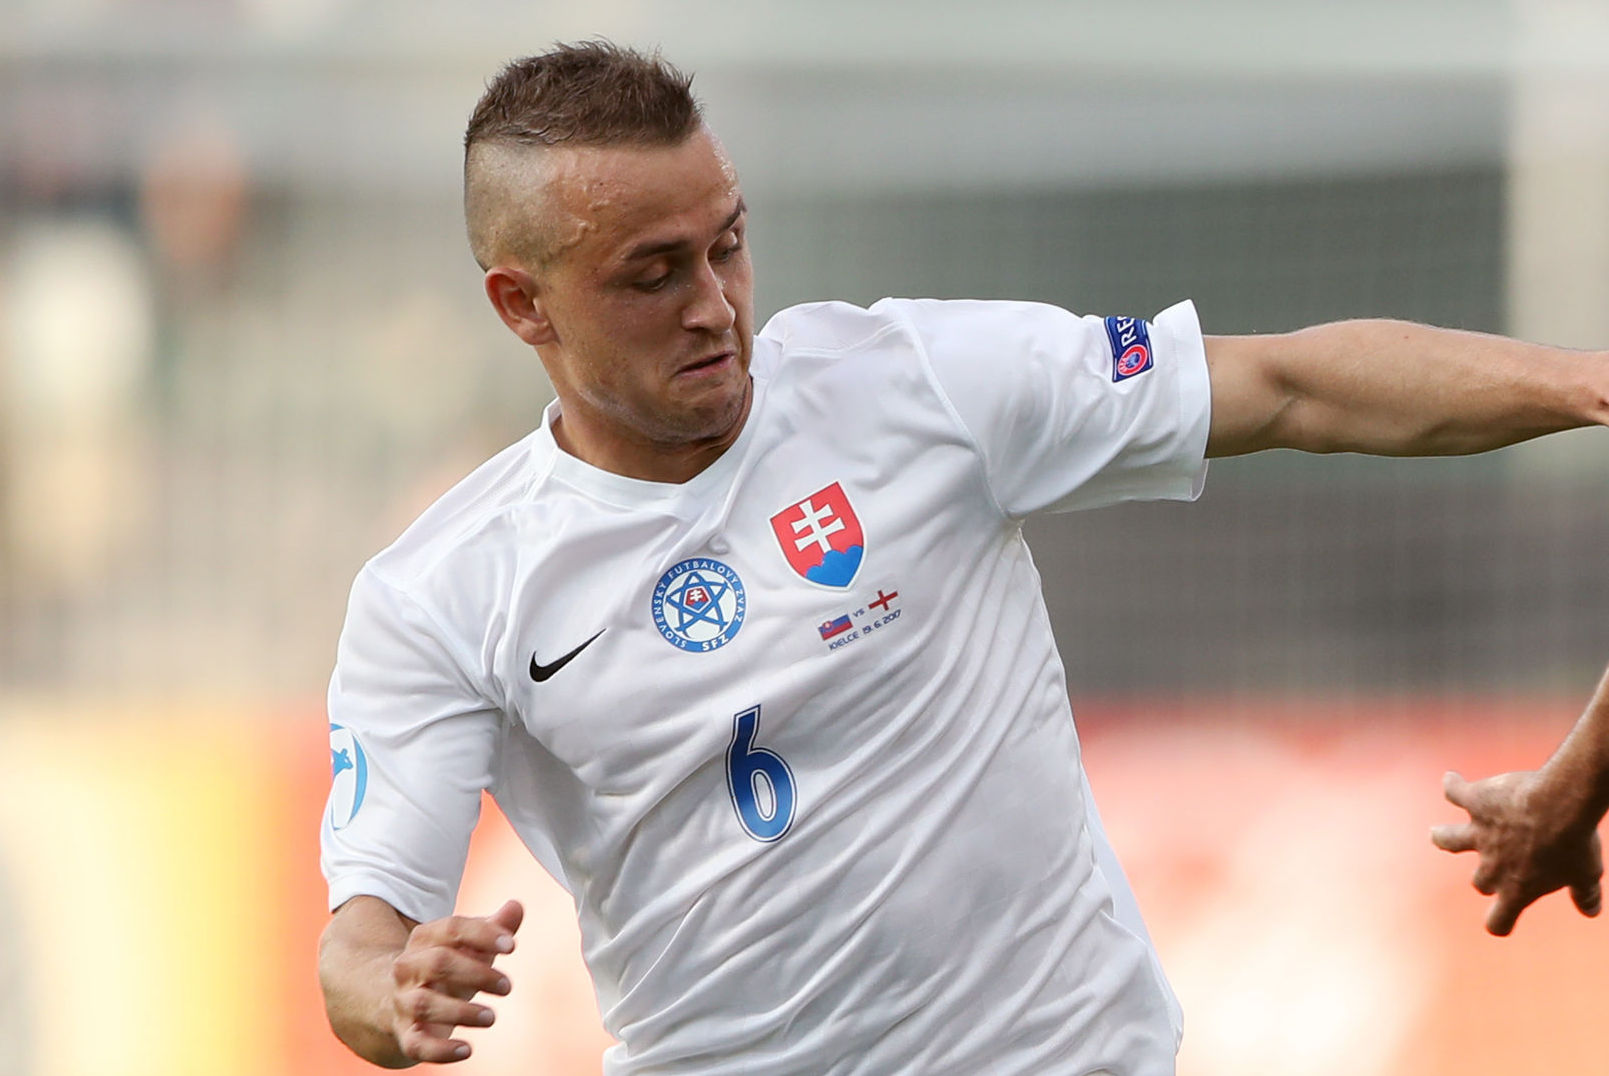 Report linking Cherries with bid for midfielder Stanislav Lobotka wide of the mark